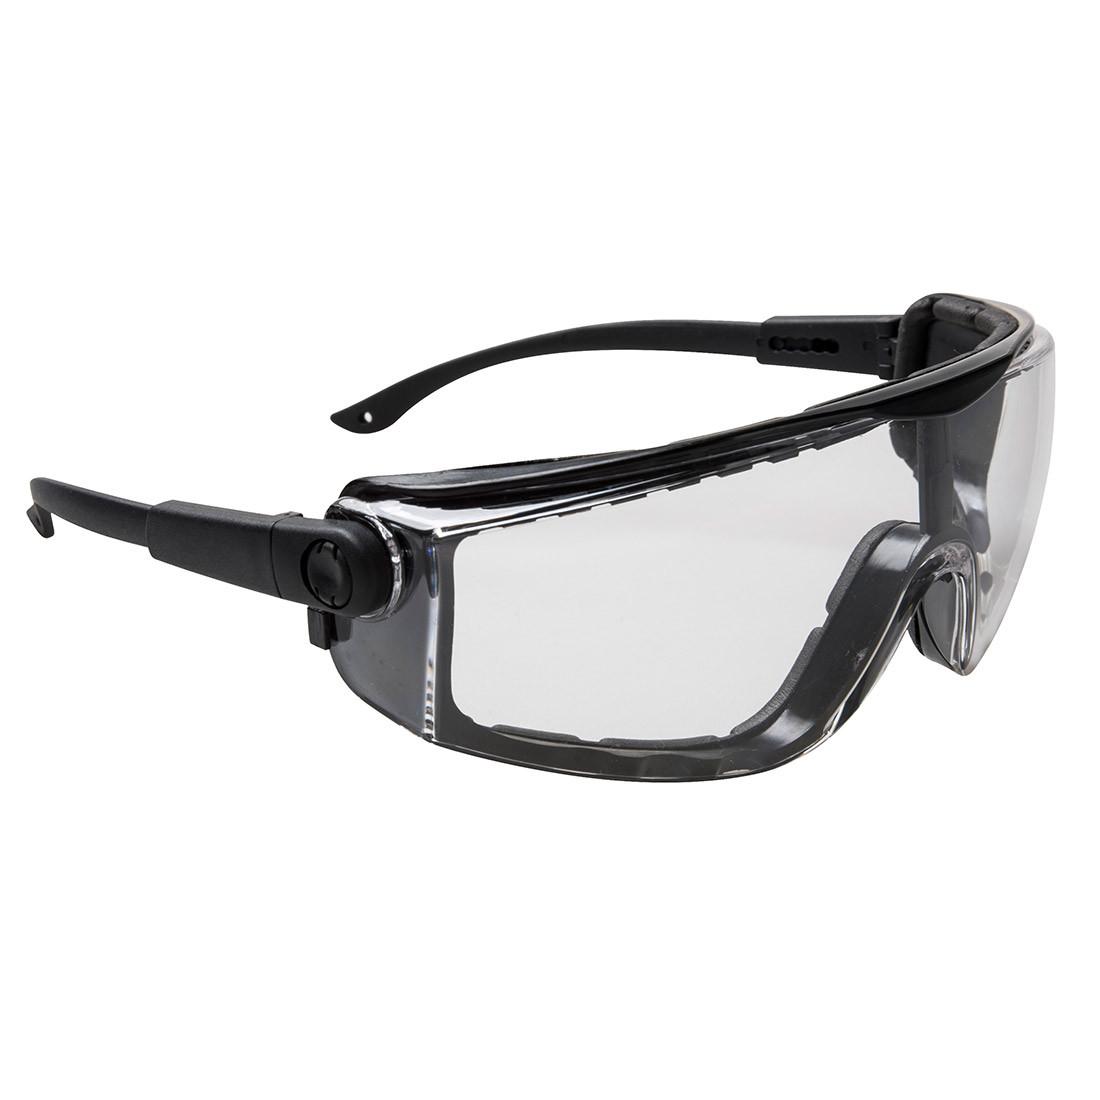 Ochelari Focus - Echipamente de protectie personala